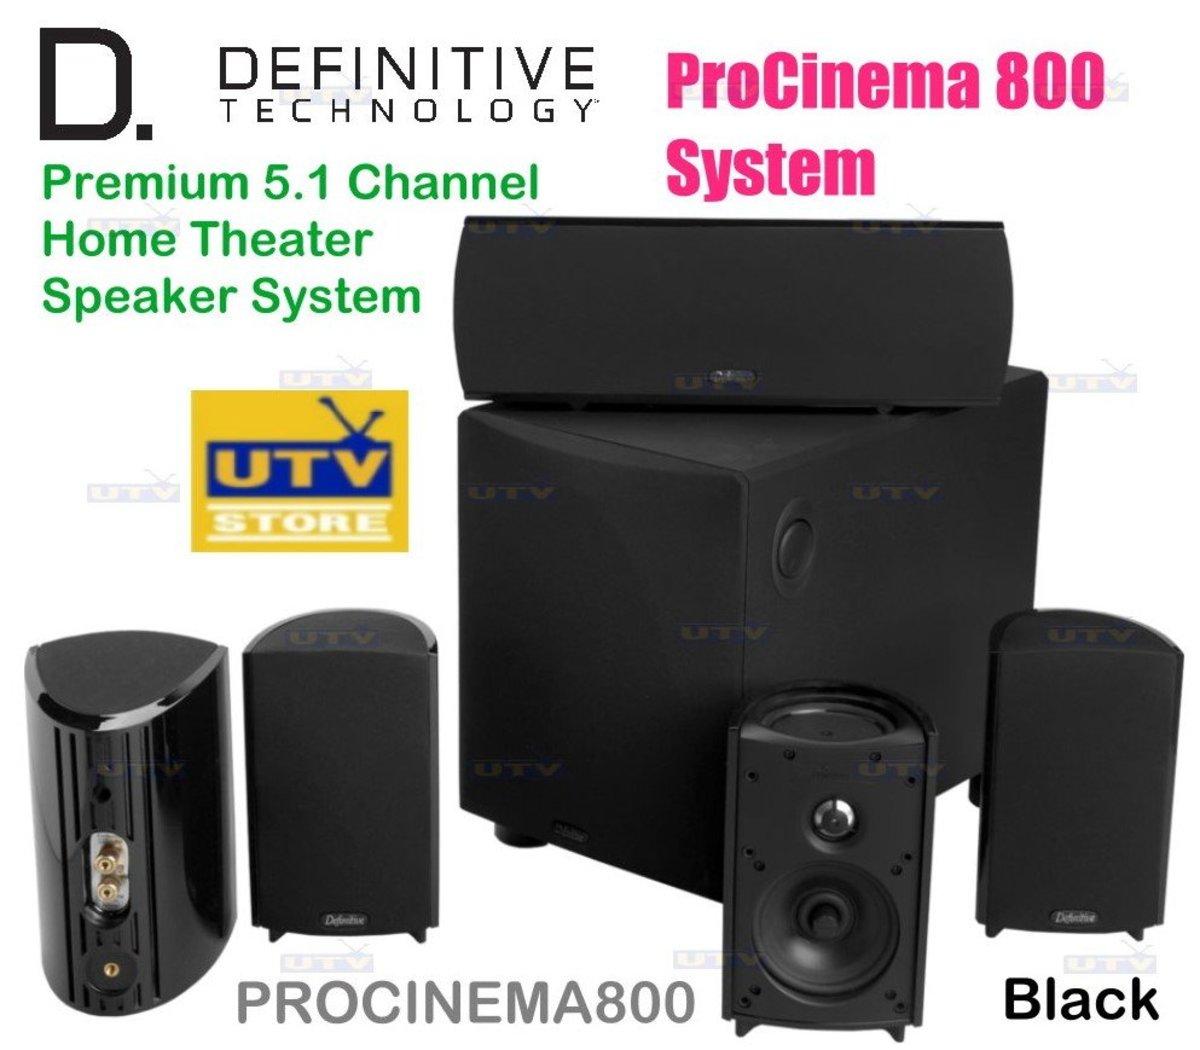 ProCinema 800 Definitive Premium 5.1 Channel Home Theater Speaker System